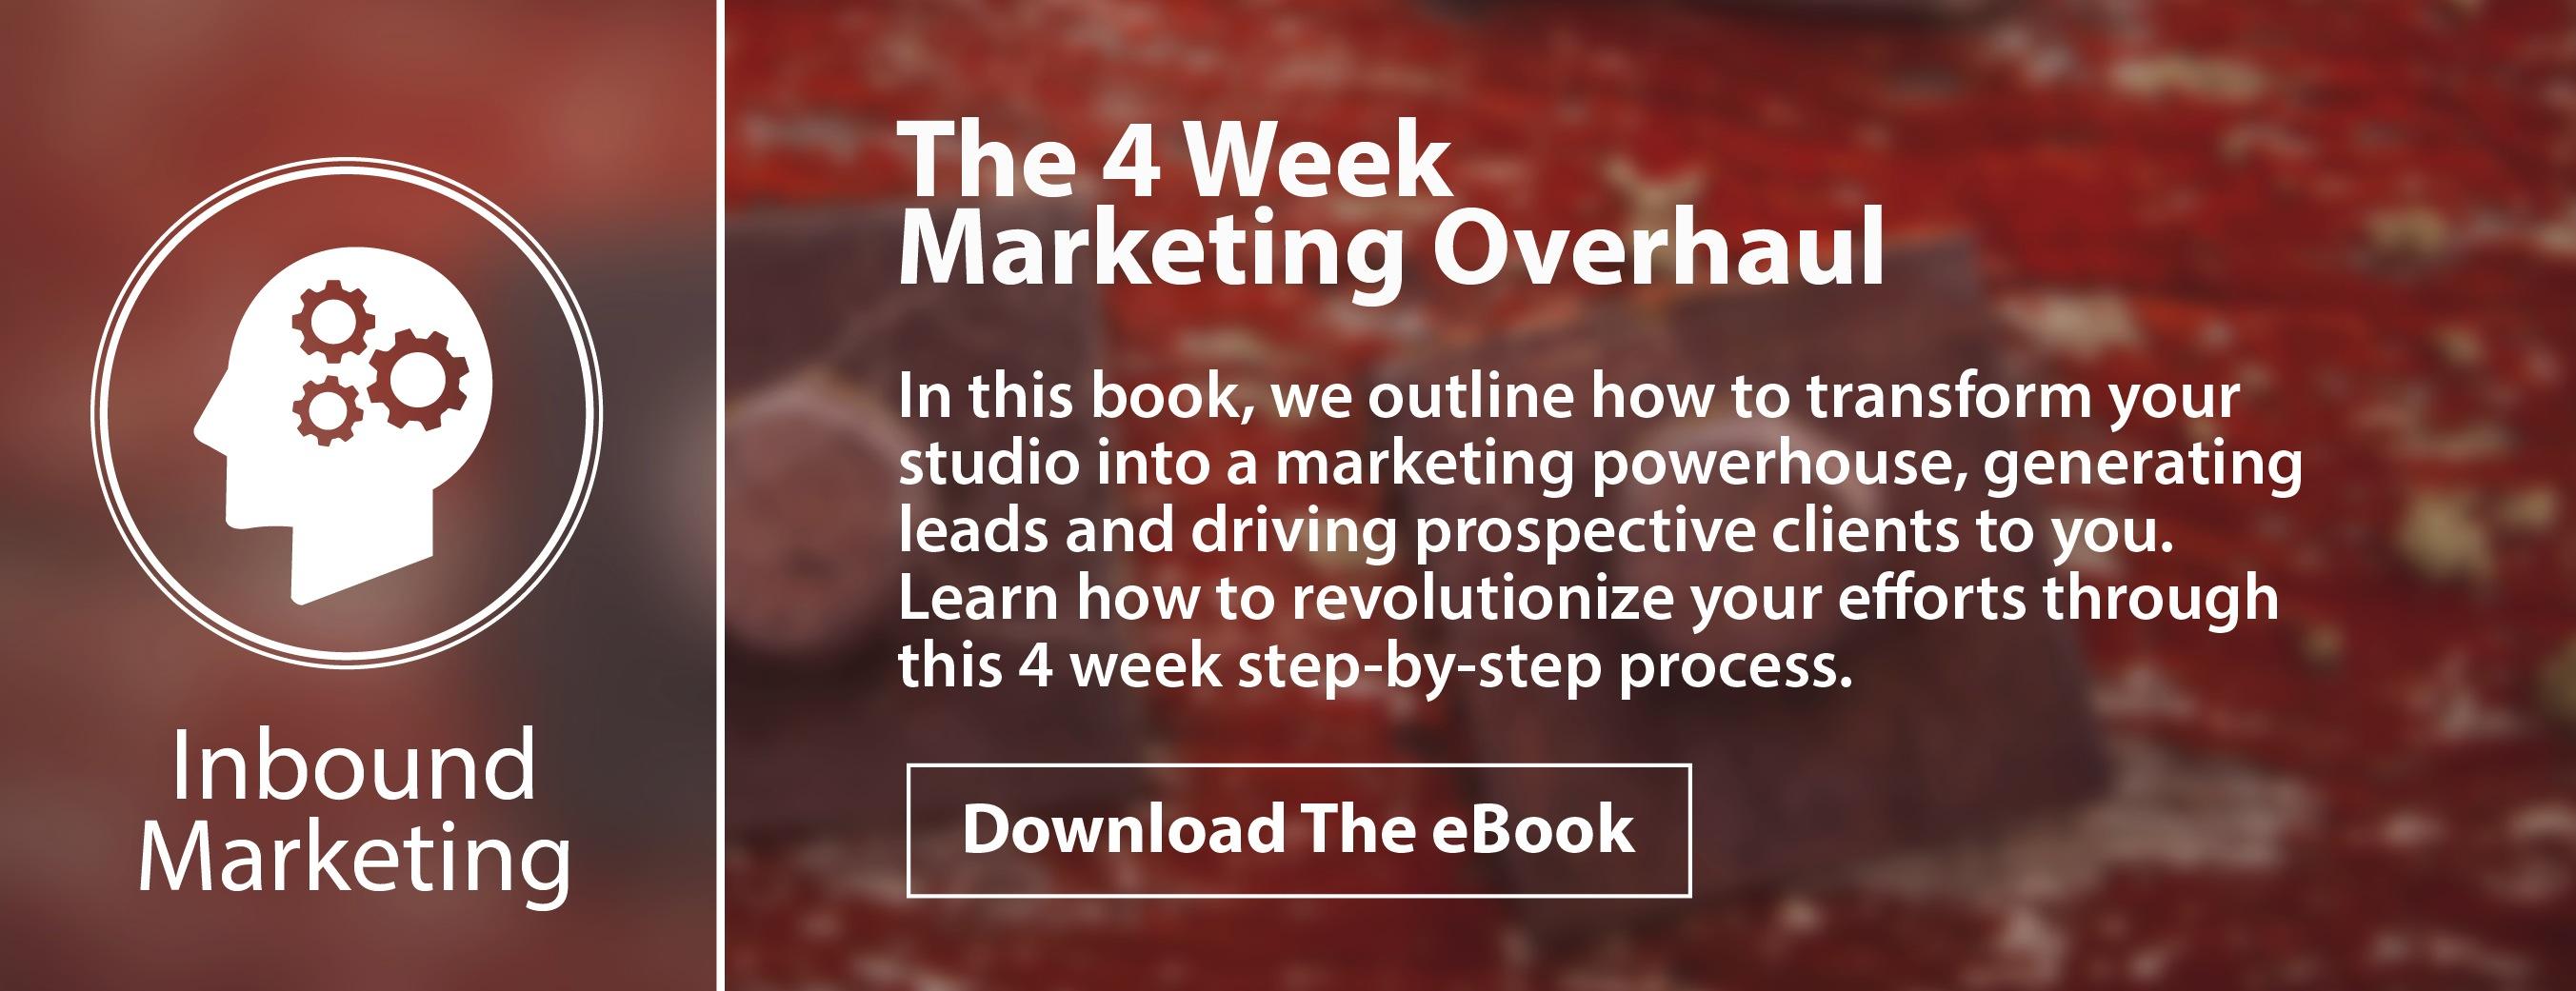 Four Week Marketing Overhaul